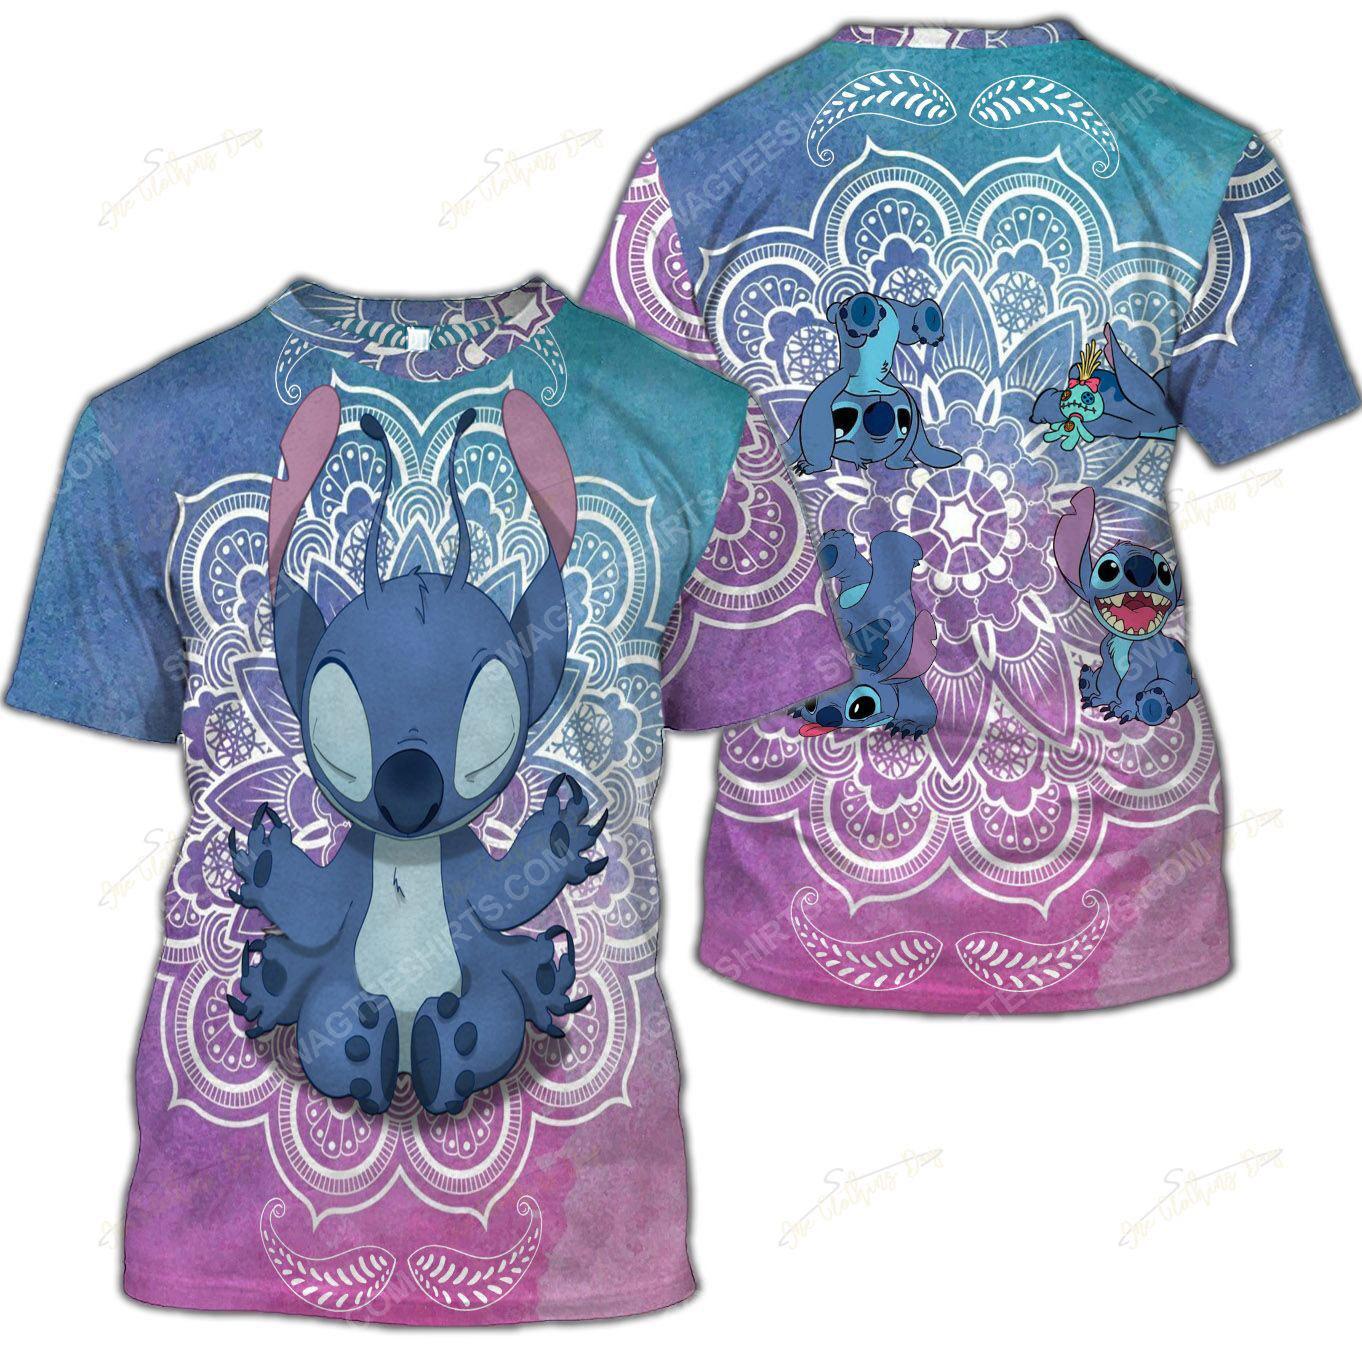 The stitch namaste full printed shirt 4(1)